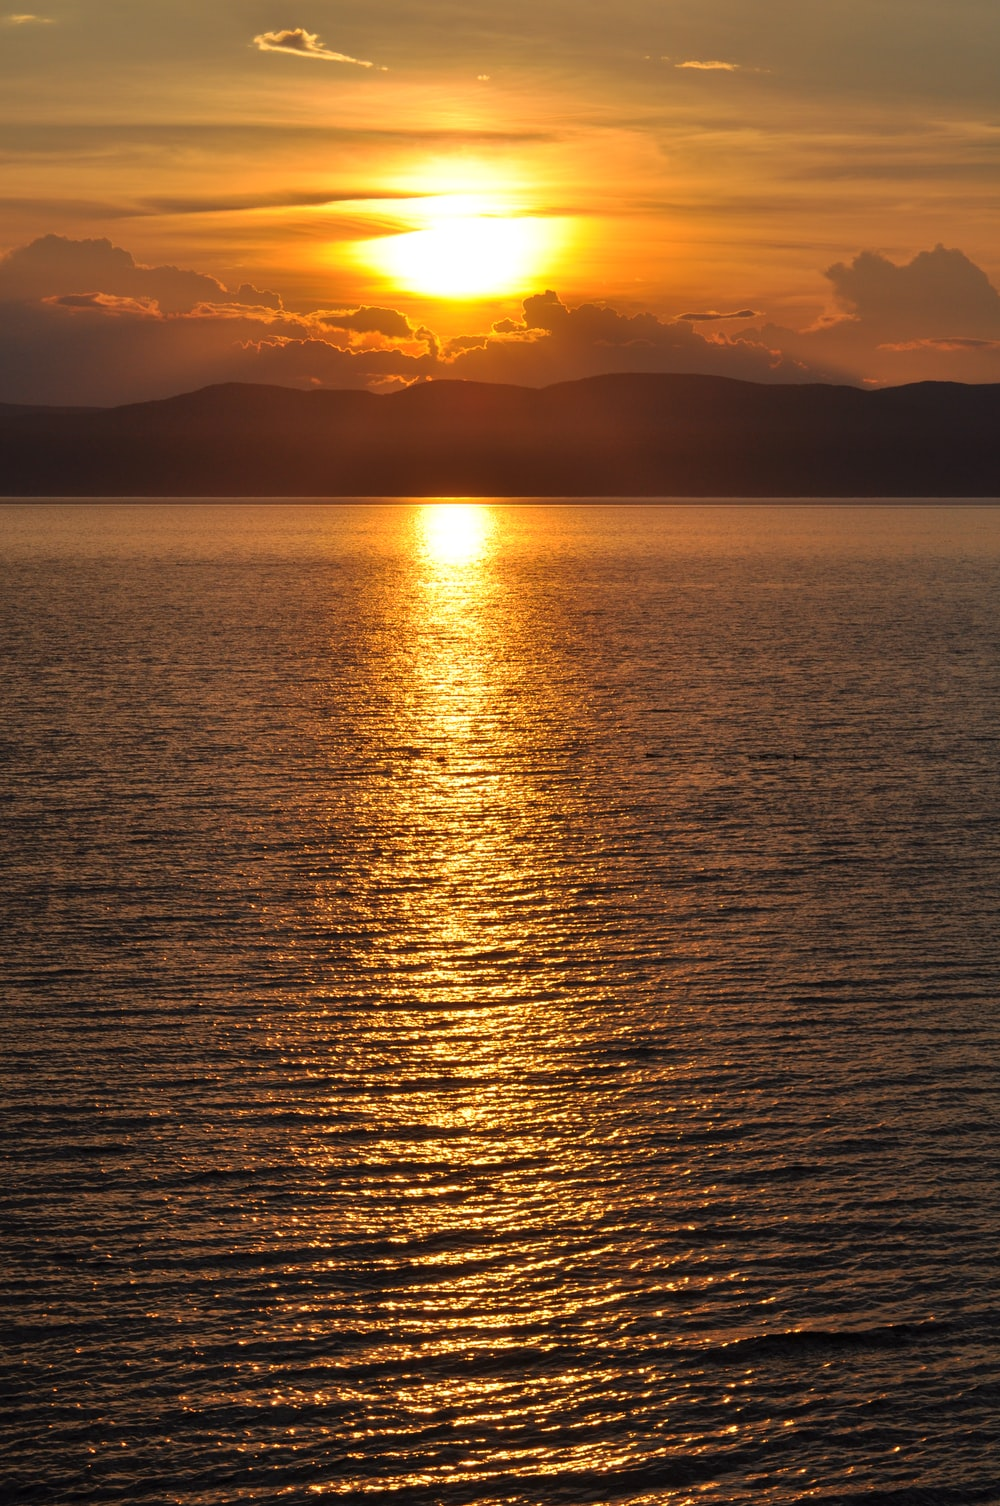 calm body of water overlooking mountain range during golden hour